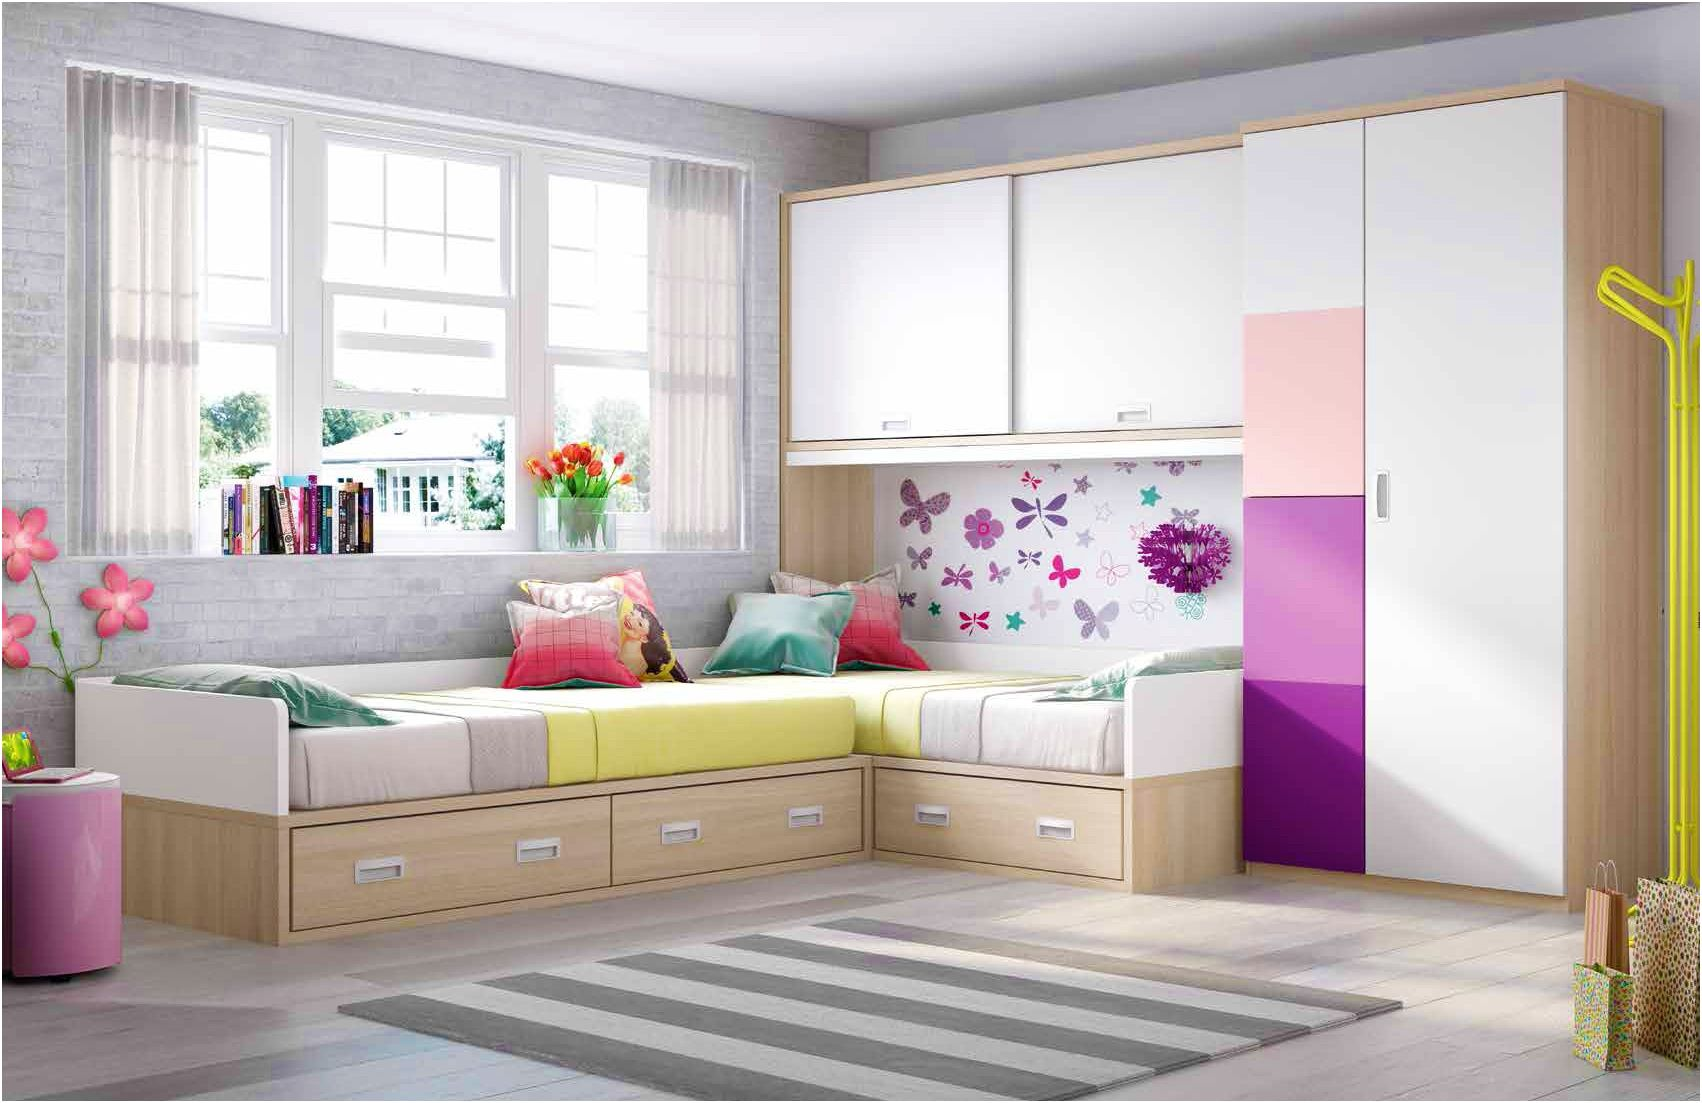 14 Brillant Chambre Fille Ikea Quartos Para Meninas Gemeas